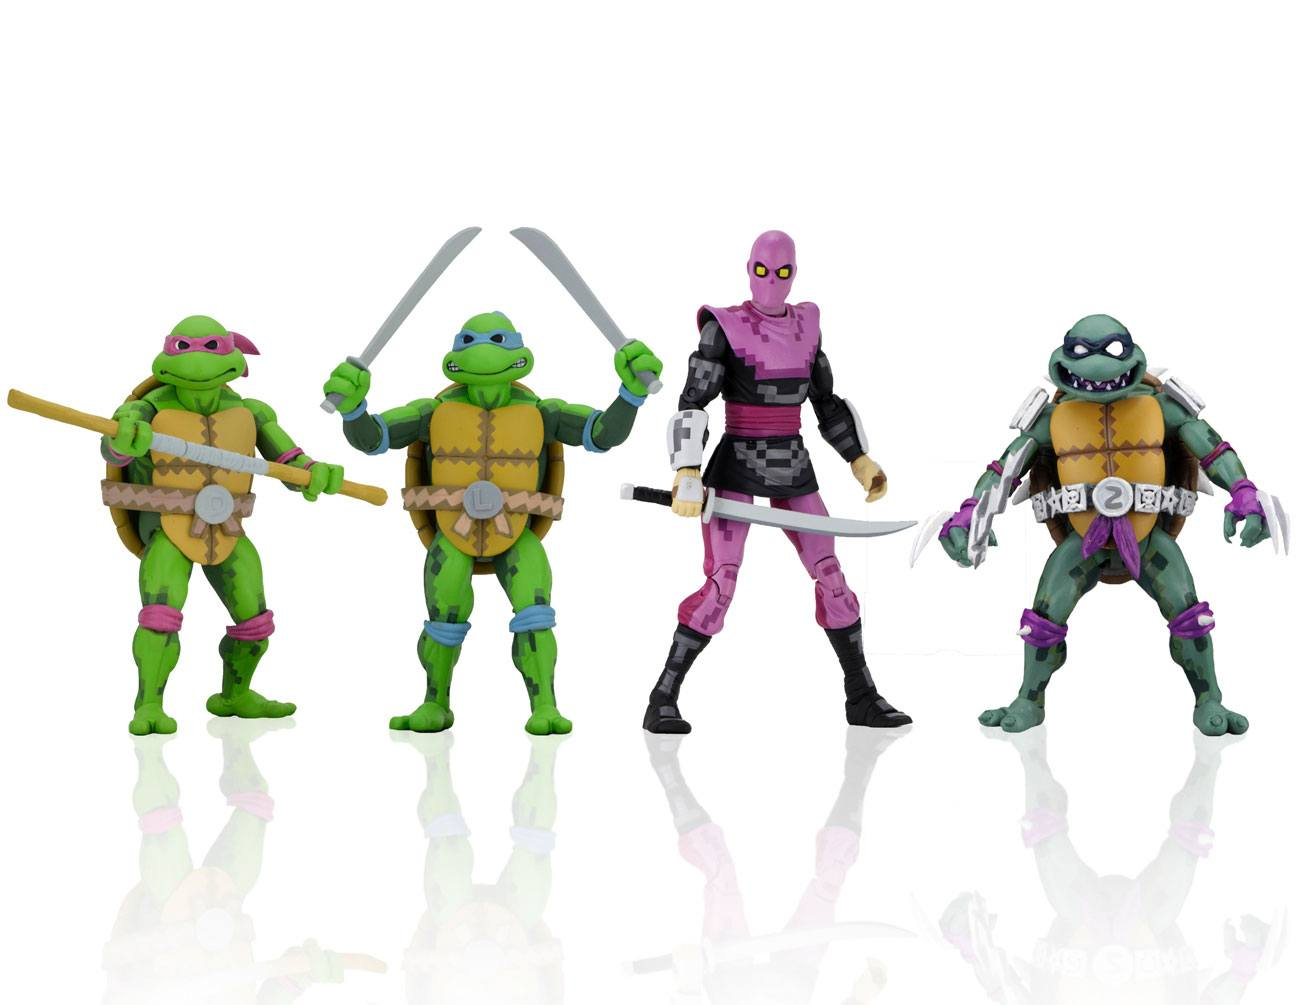 Teenage Mutant Ninja Turtles: Turtles in Time Action Figures 18 cm Series 1 Assortment (14)